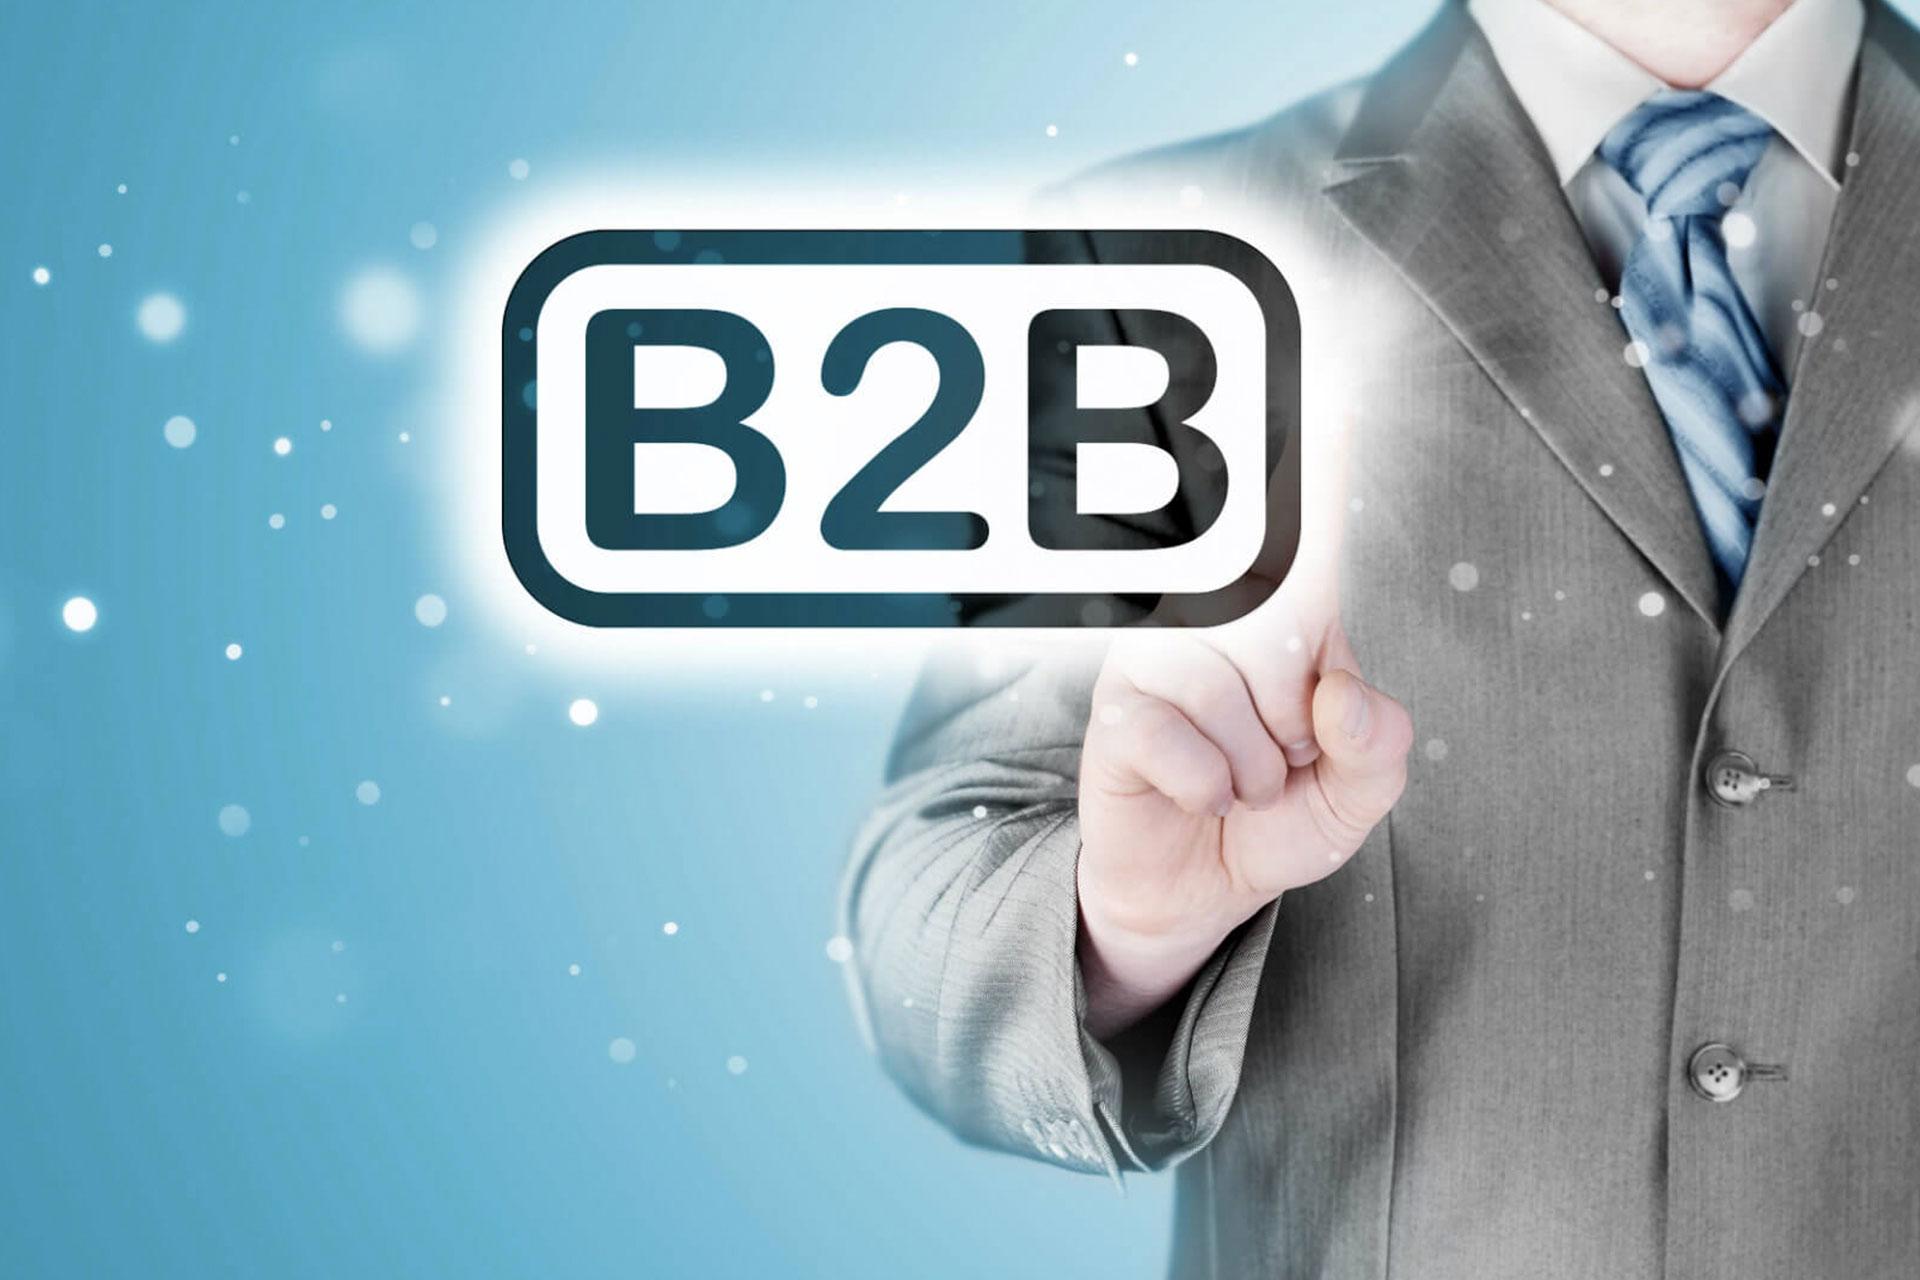 Онлайн-тренинг «Мастер управления B2B продажами»